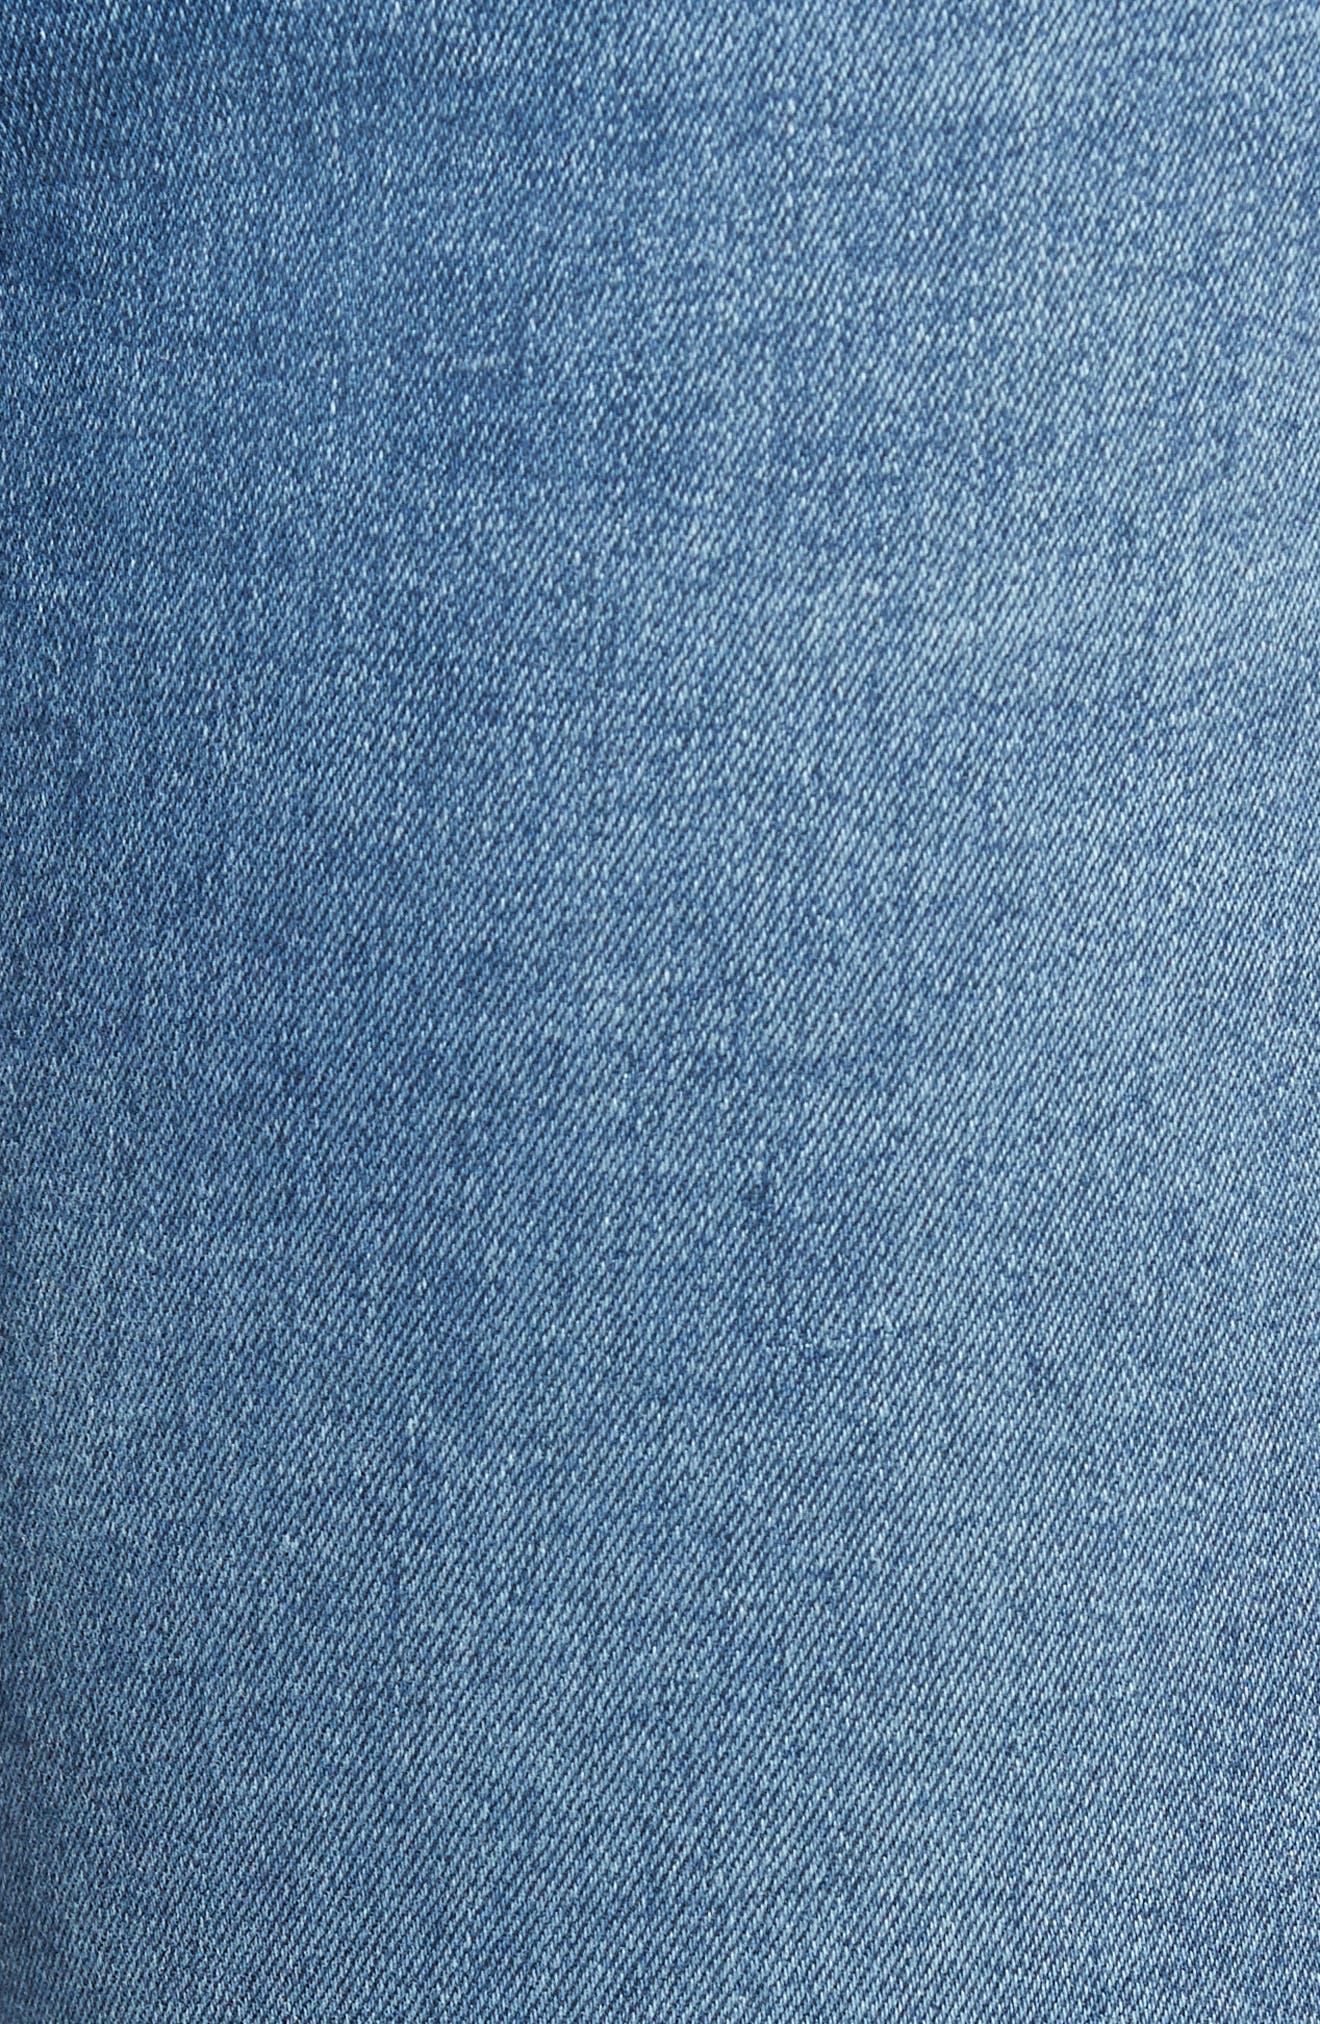 Santana Ripped Skinny Jeans,                             Alternate thumbnail 5, color,